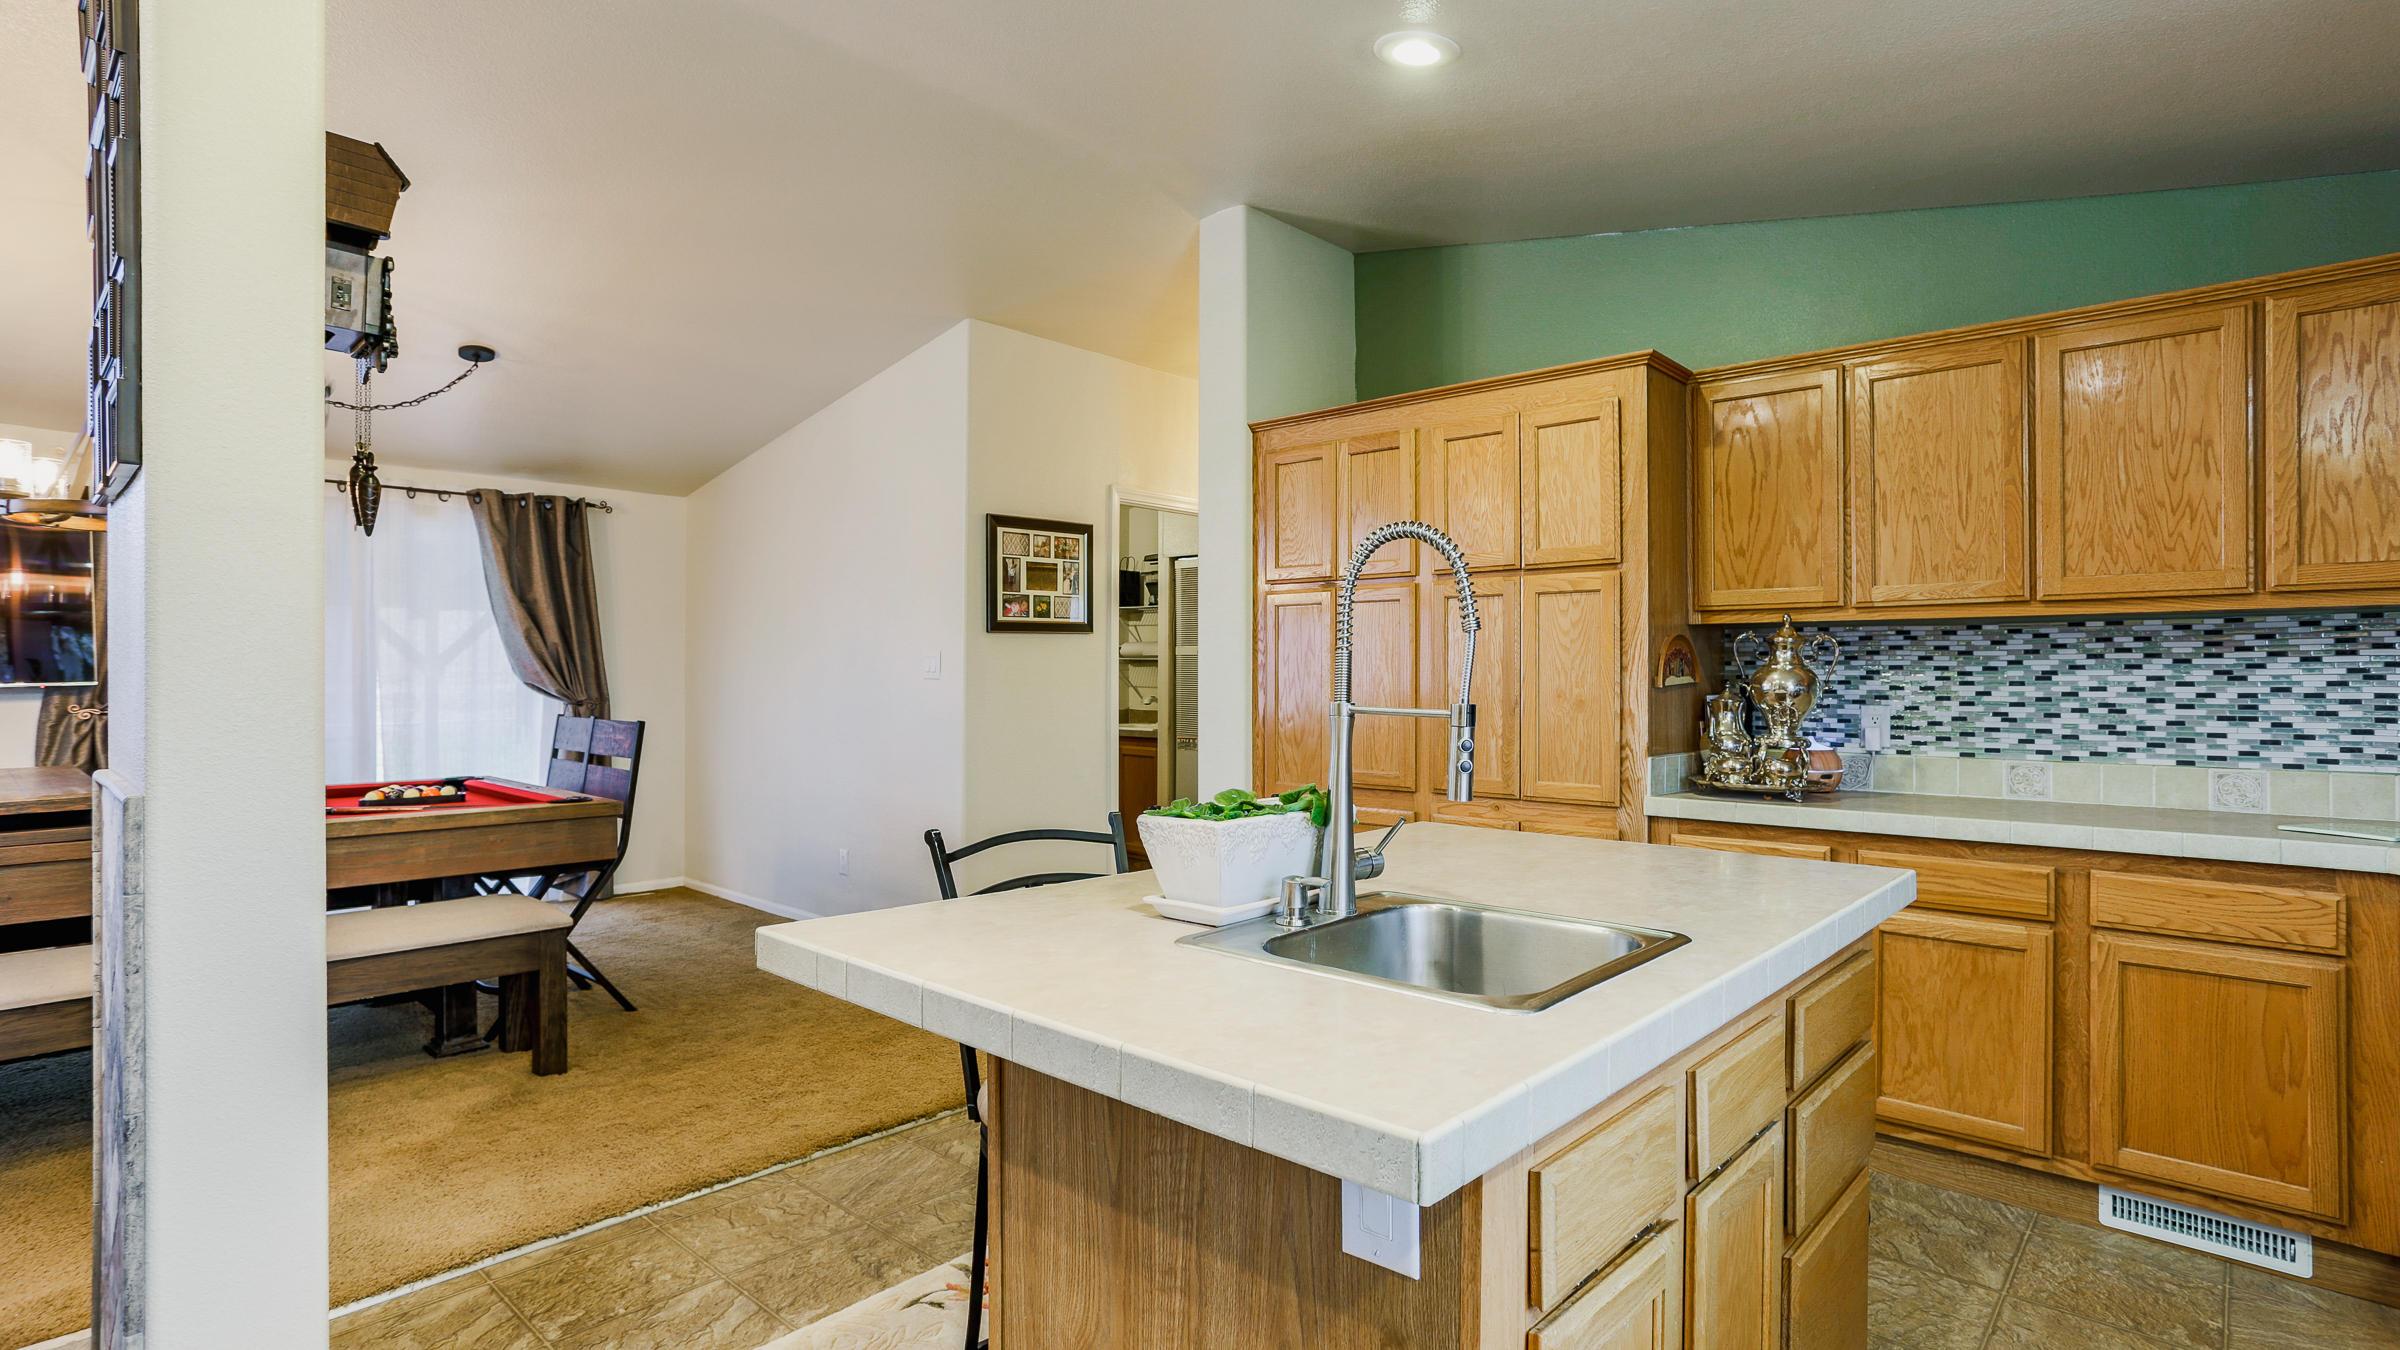 17180 Deacon Ln, Cottonwood, CA 96022 (MLS# 18-1185) - HOUSE